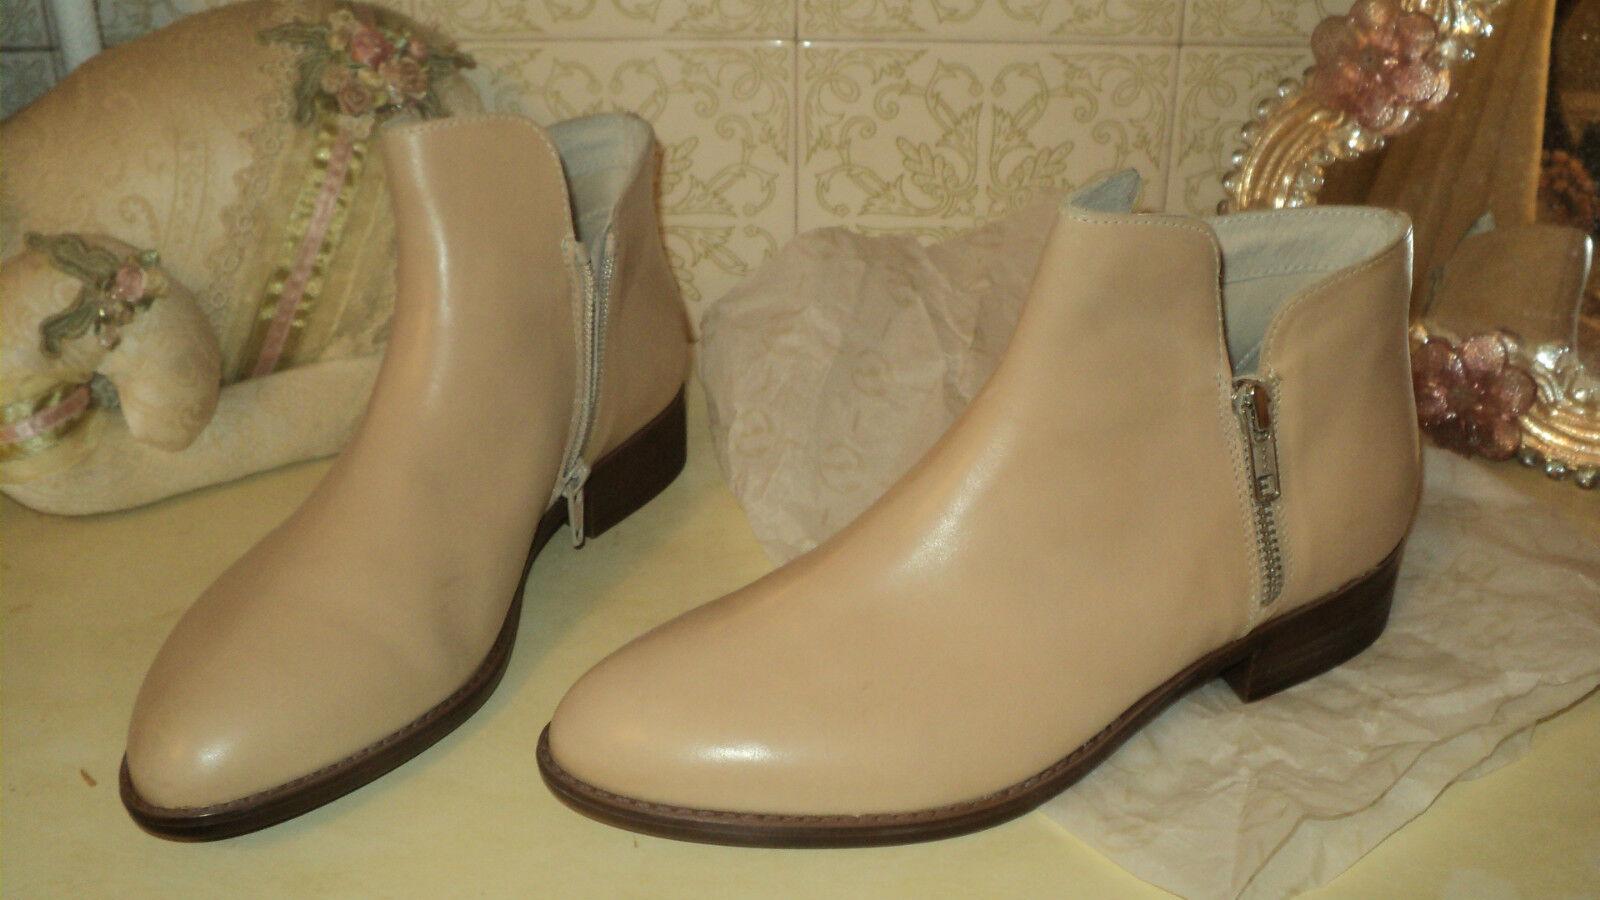 ITALIAN BATA BEIGE LEATHER ANKLE Schuhe BOOTS LOW HEELS 2 ZIPPERS EU38UK5US7.5